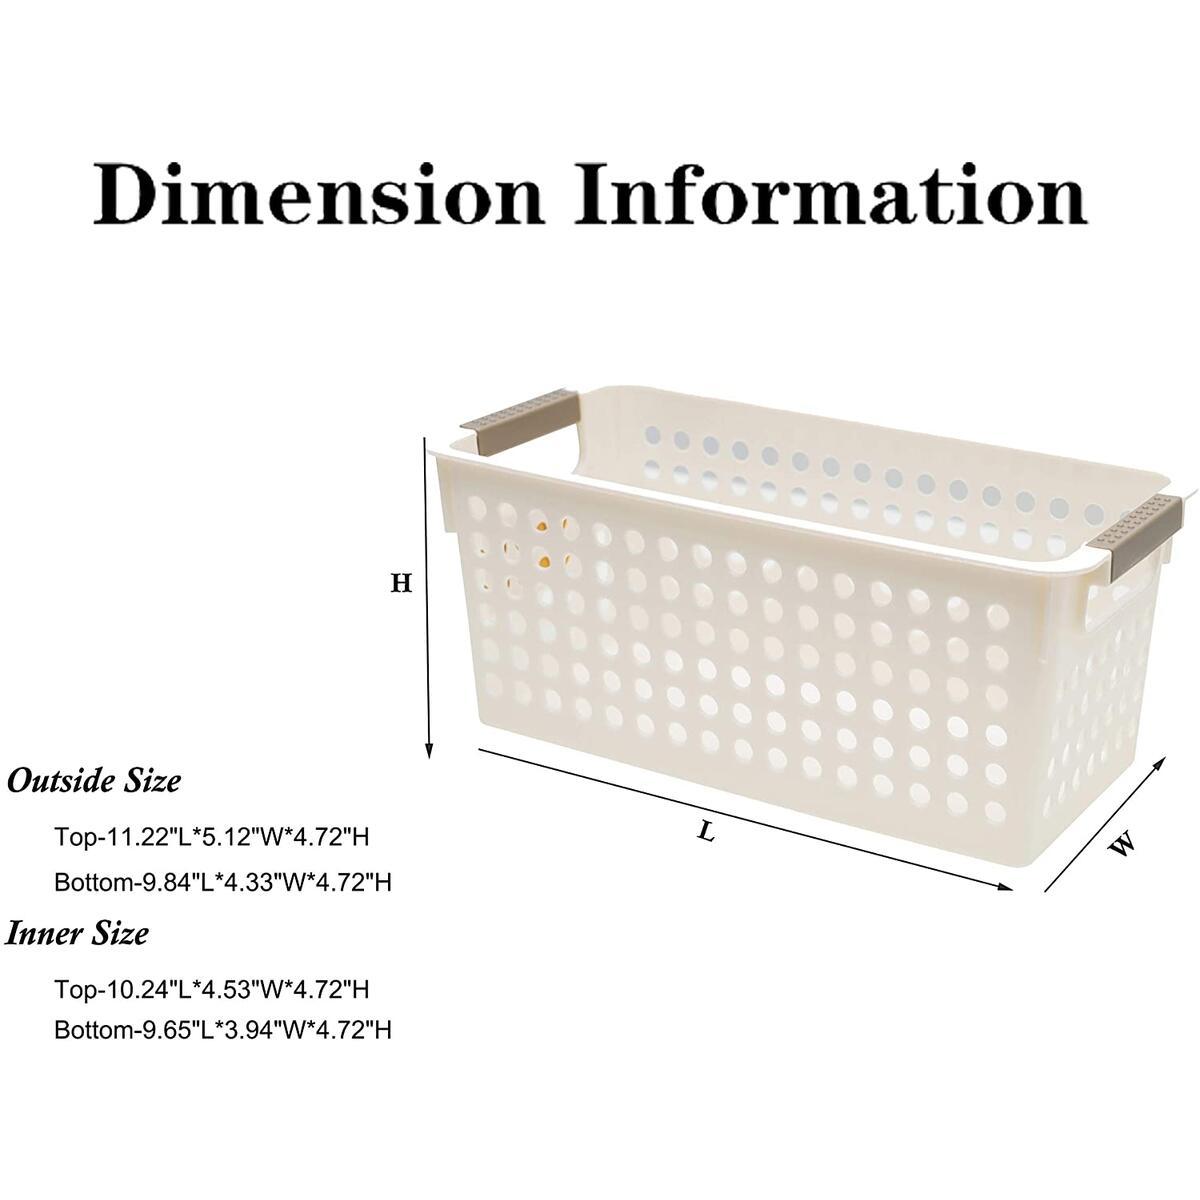 ITYLIFE CITYLIFE Small Plastic Storage Basket Bathroom Shelf Baskets Kitchen Organizing Pantry Storage Bins Off-White 6 PC